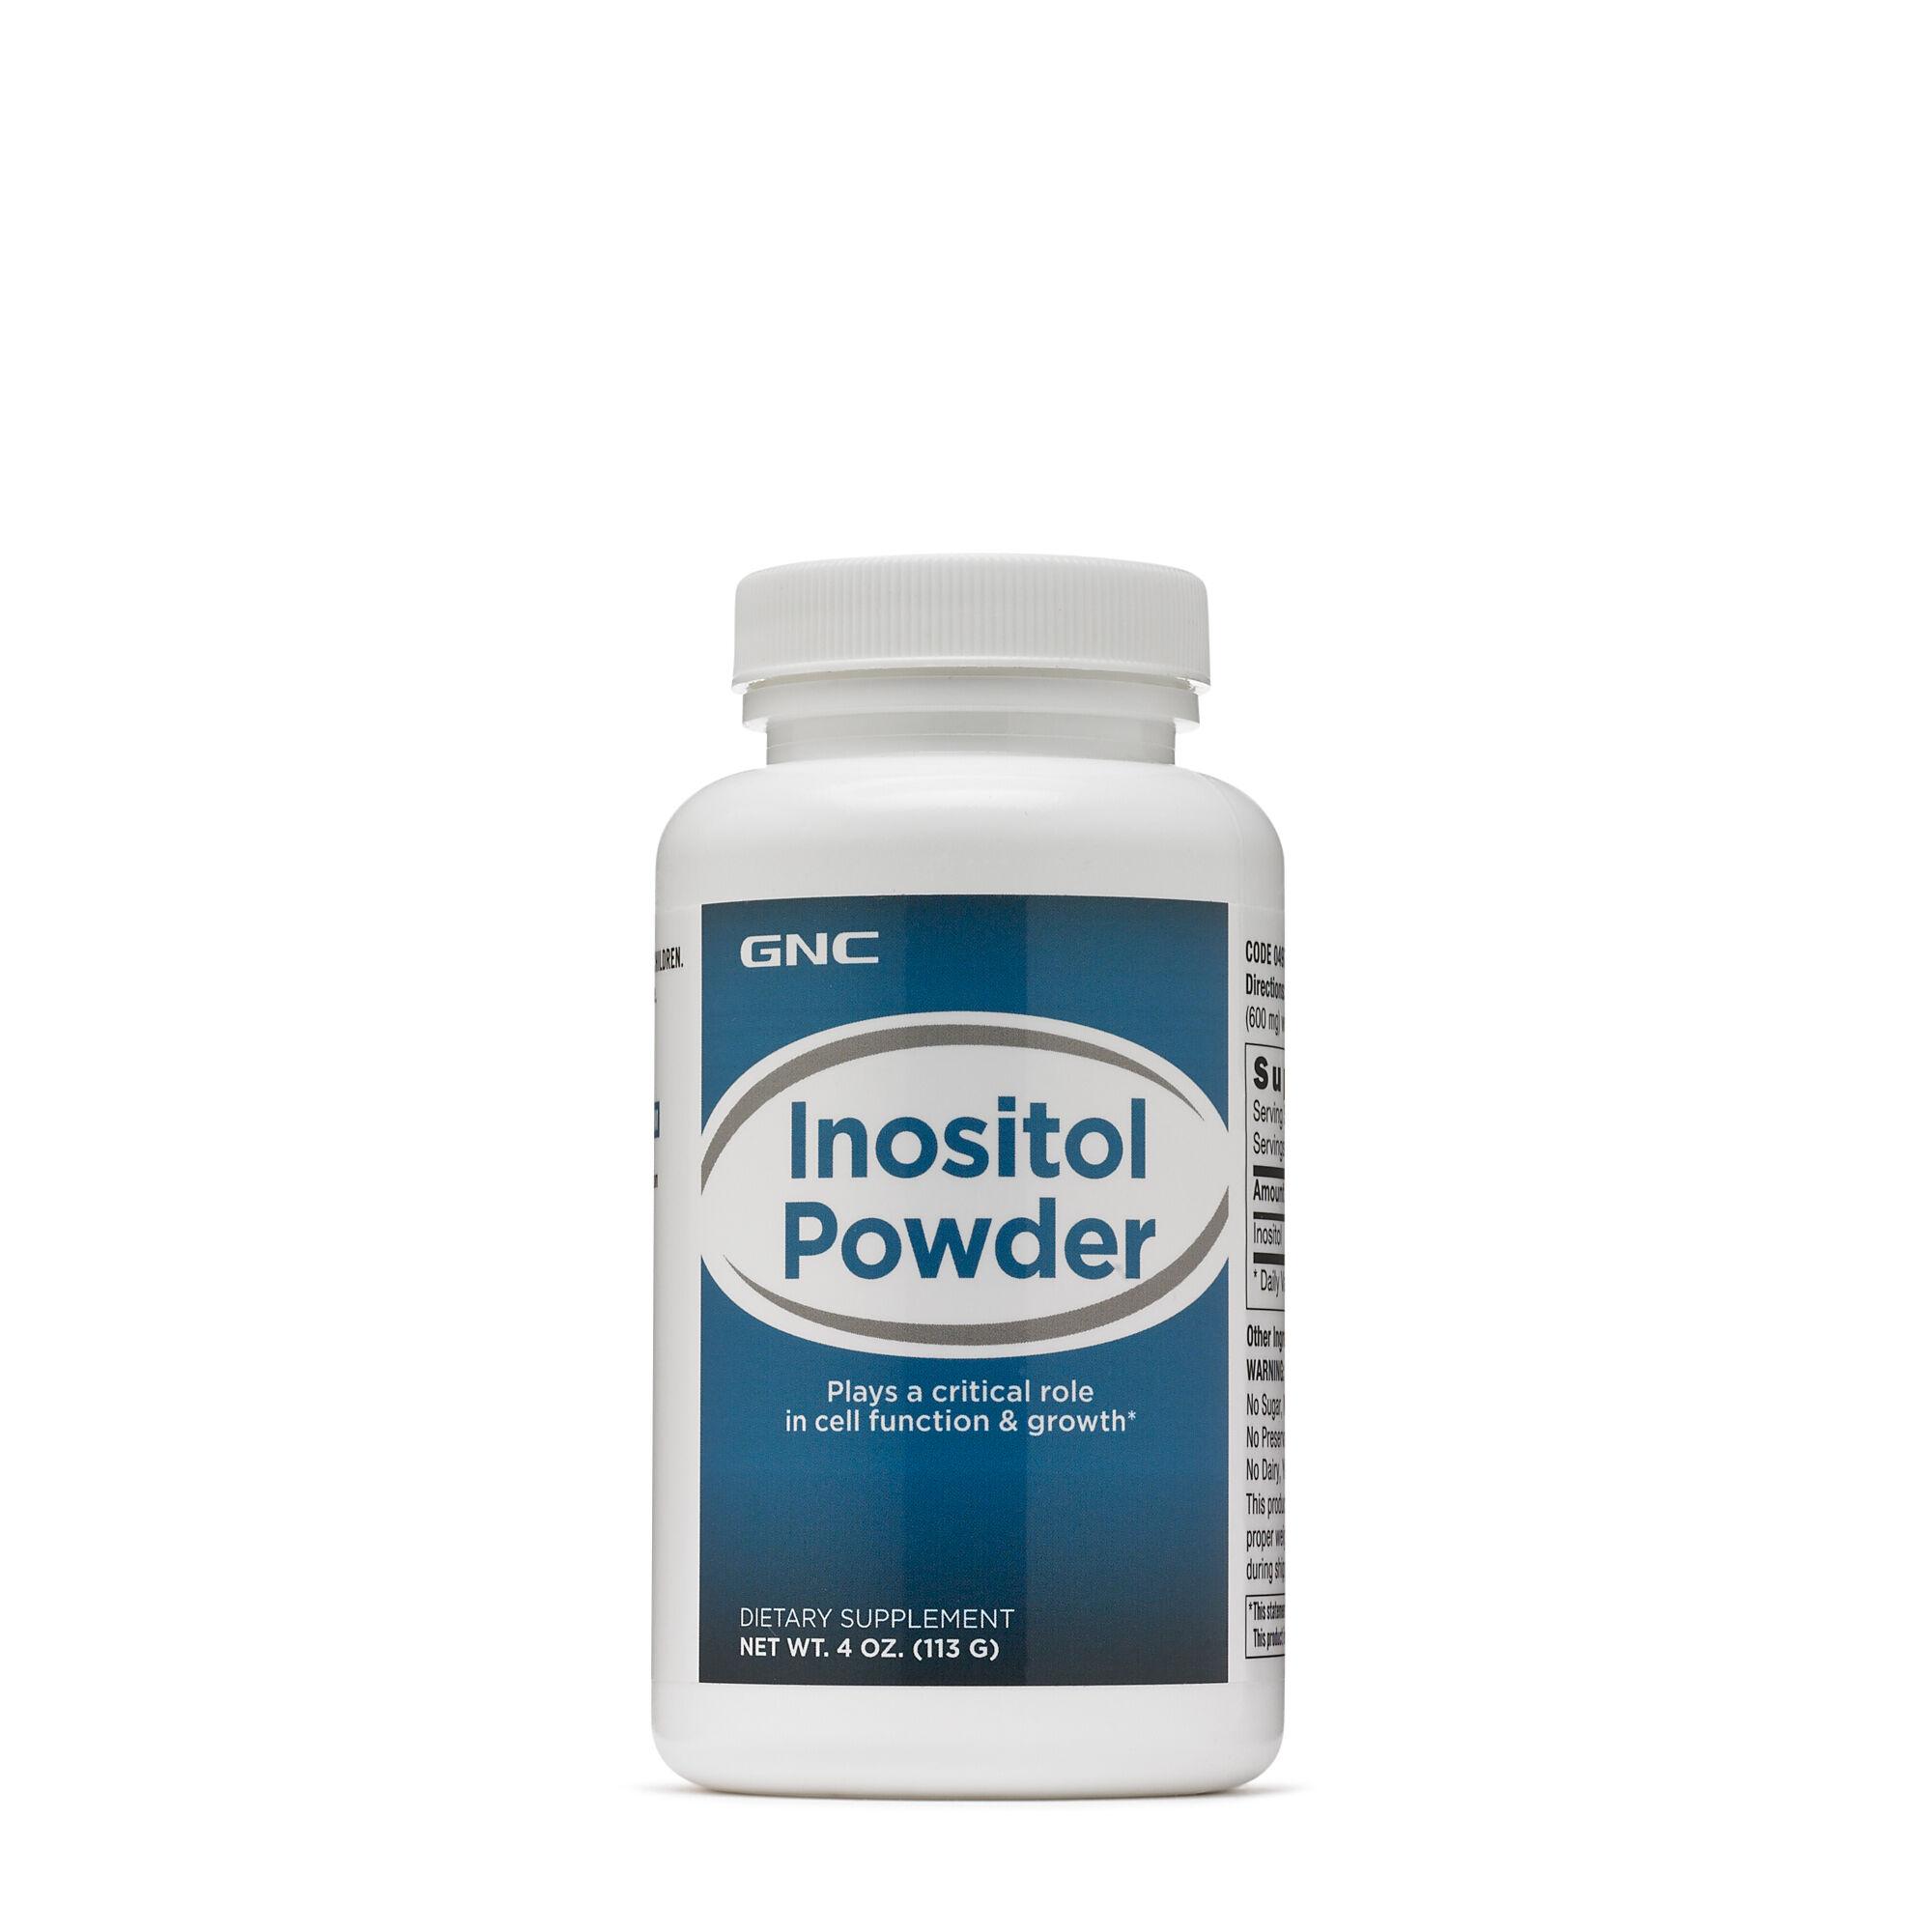 Inositol powder uses